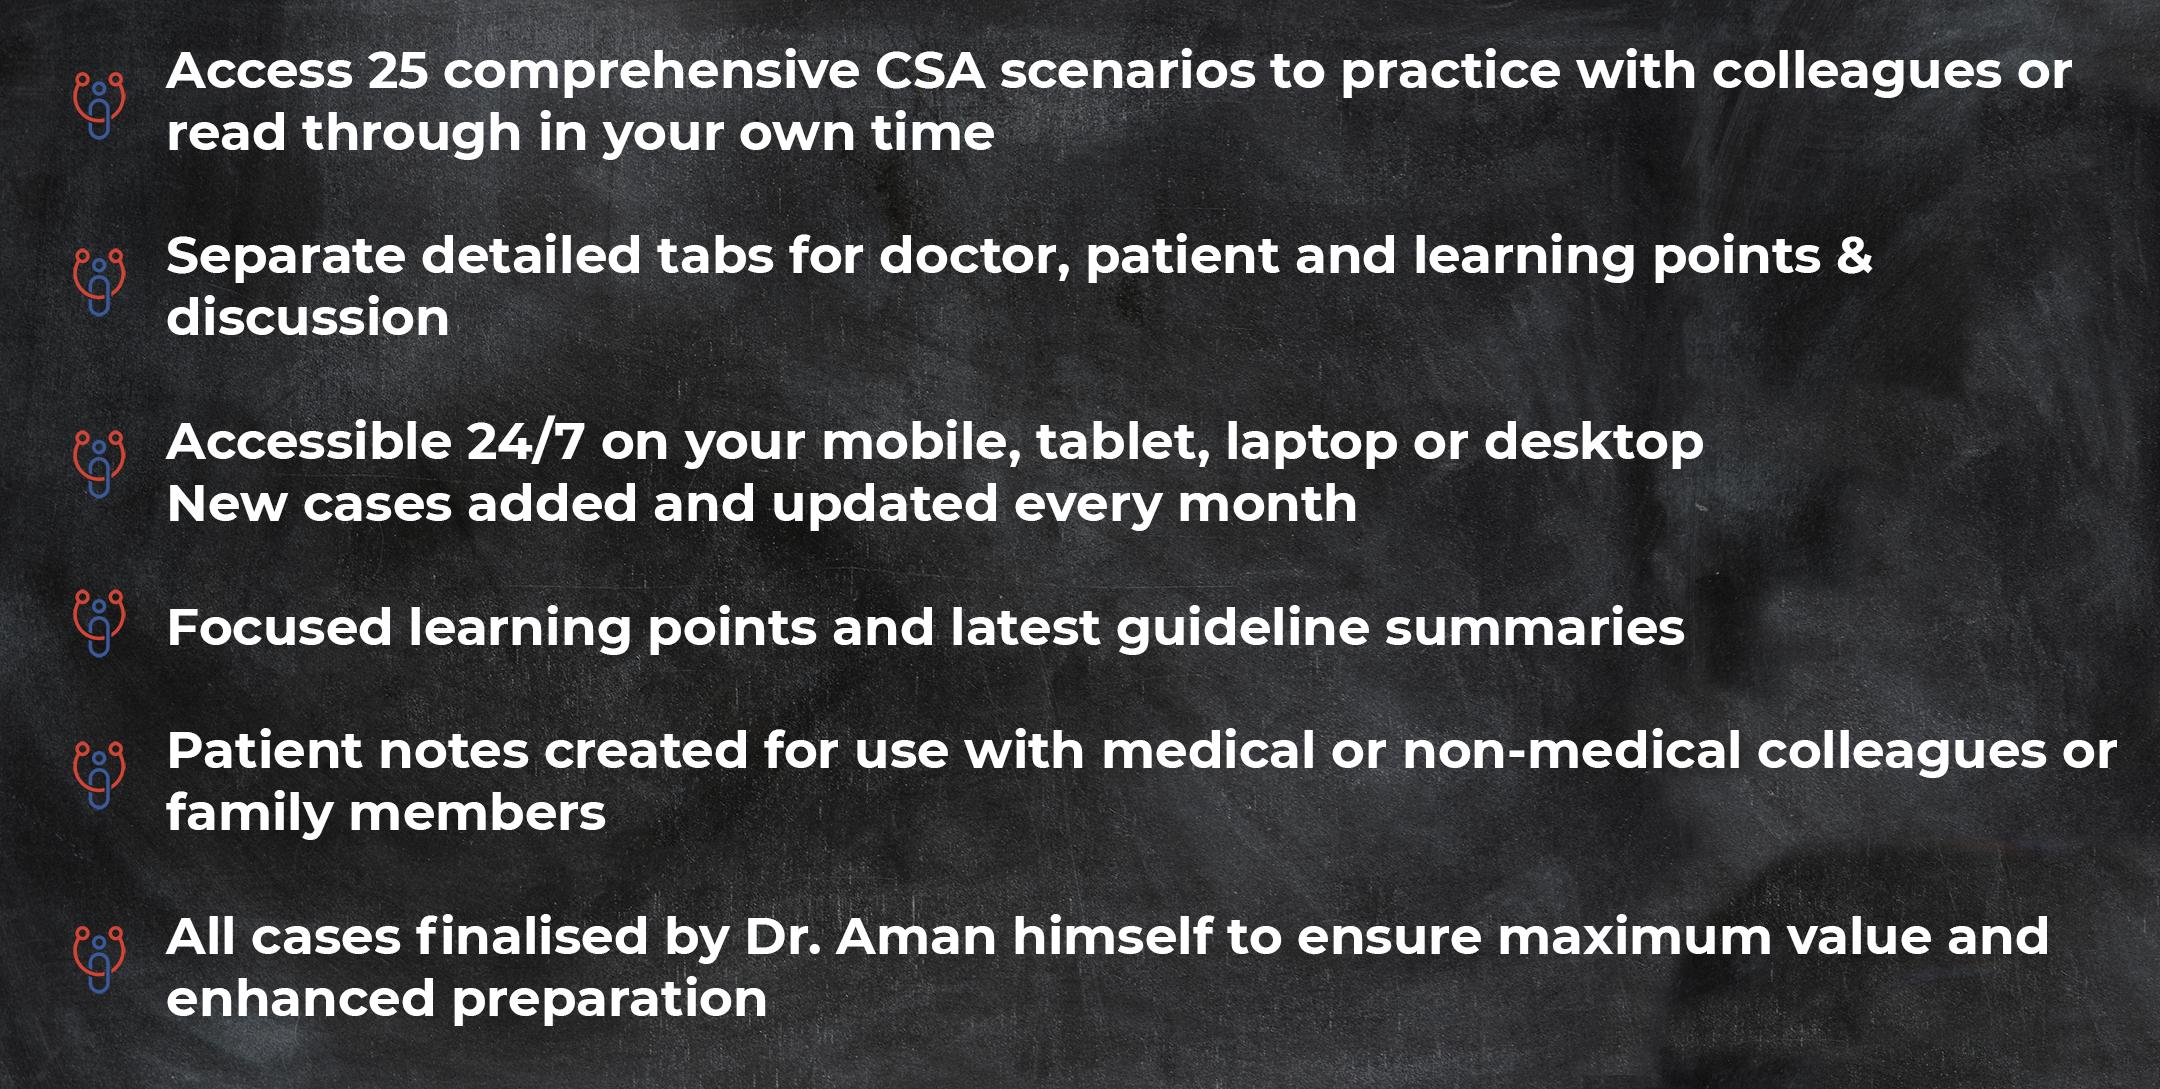 csa details - MRCGP CSA, AKT and PLAB Exam Courses and Online Webinars - Arora Medical Education